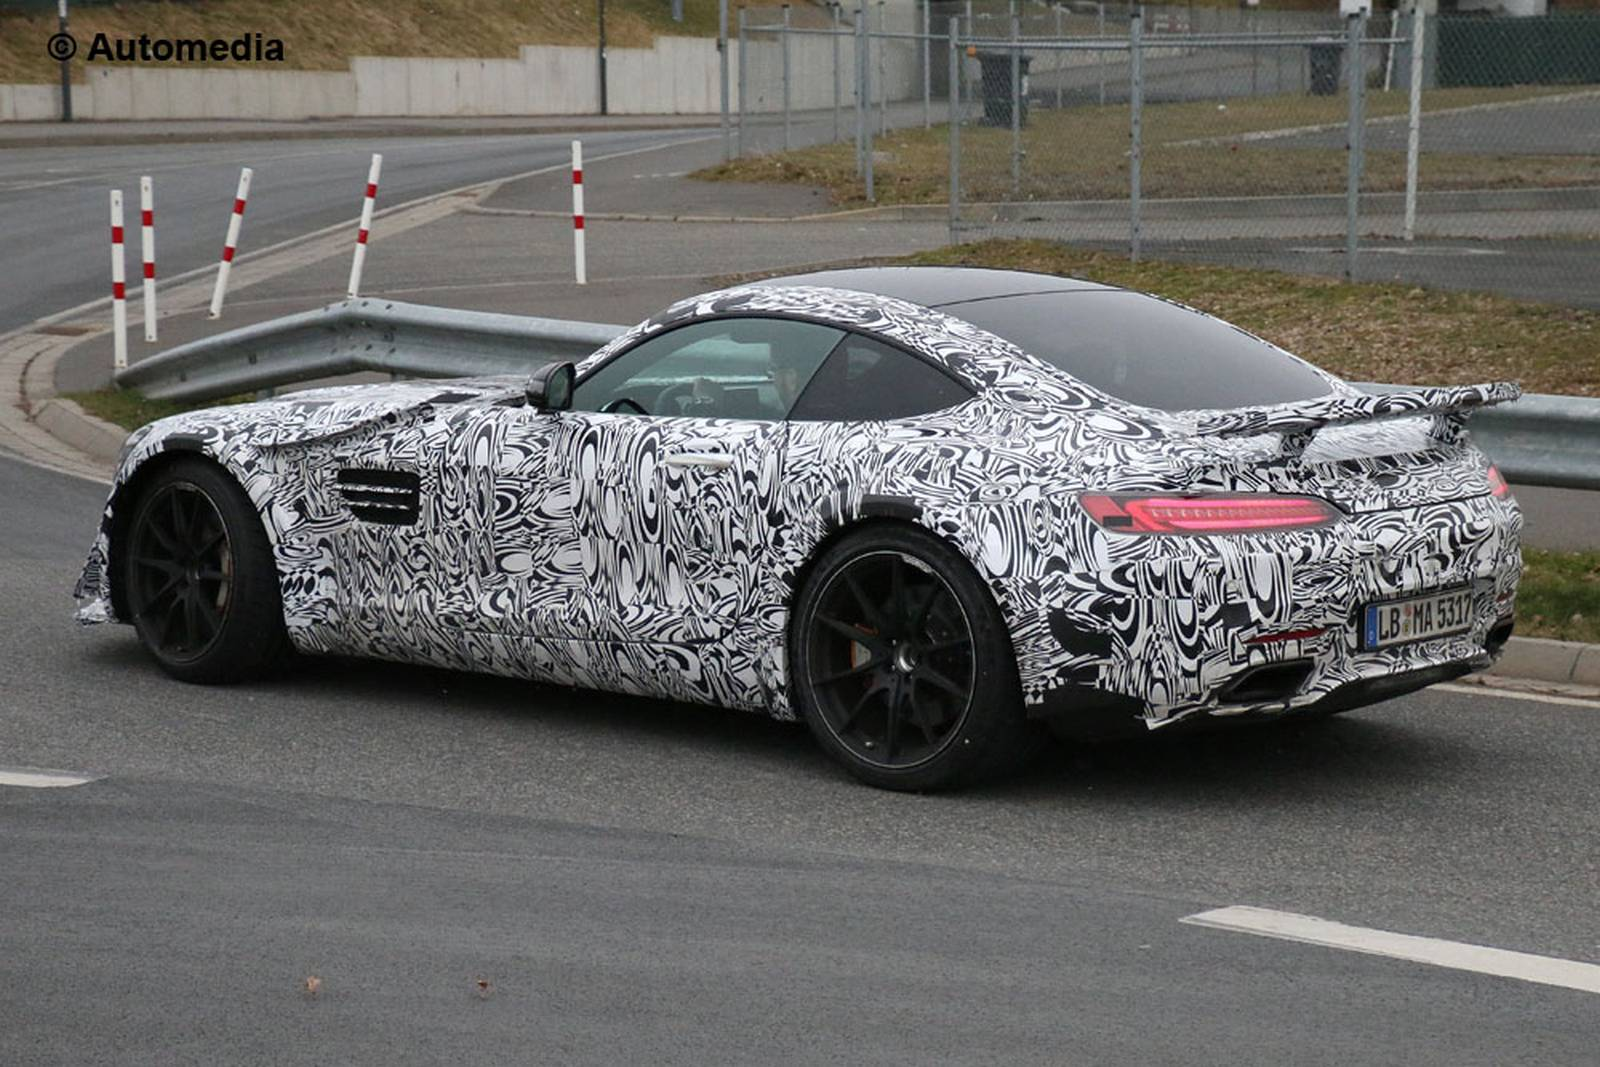 Mercedes-AMG GT3 road car testing spain